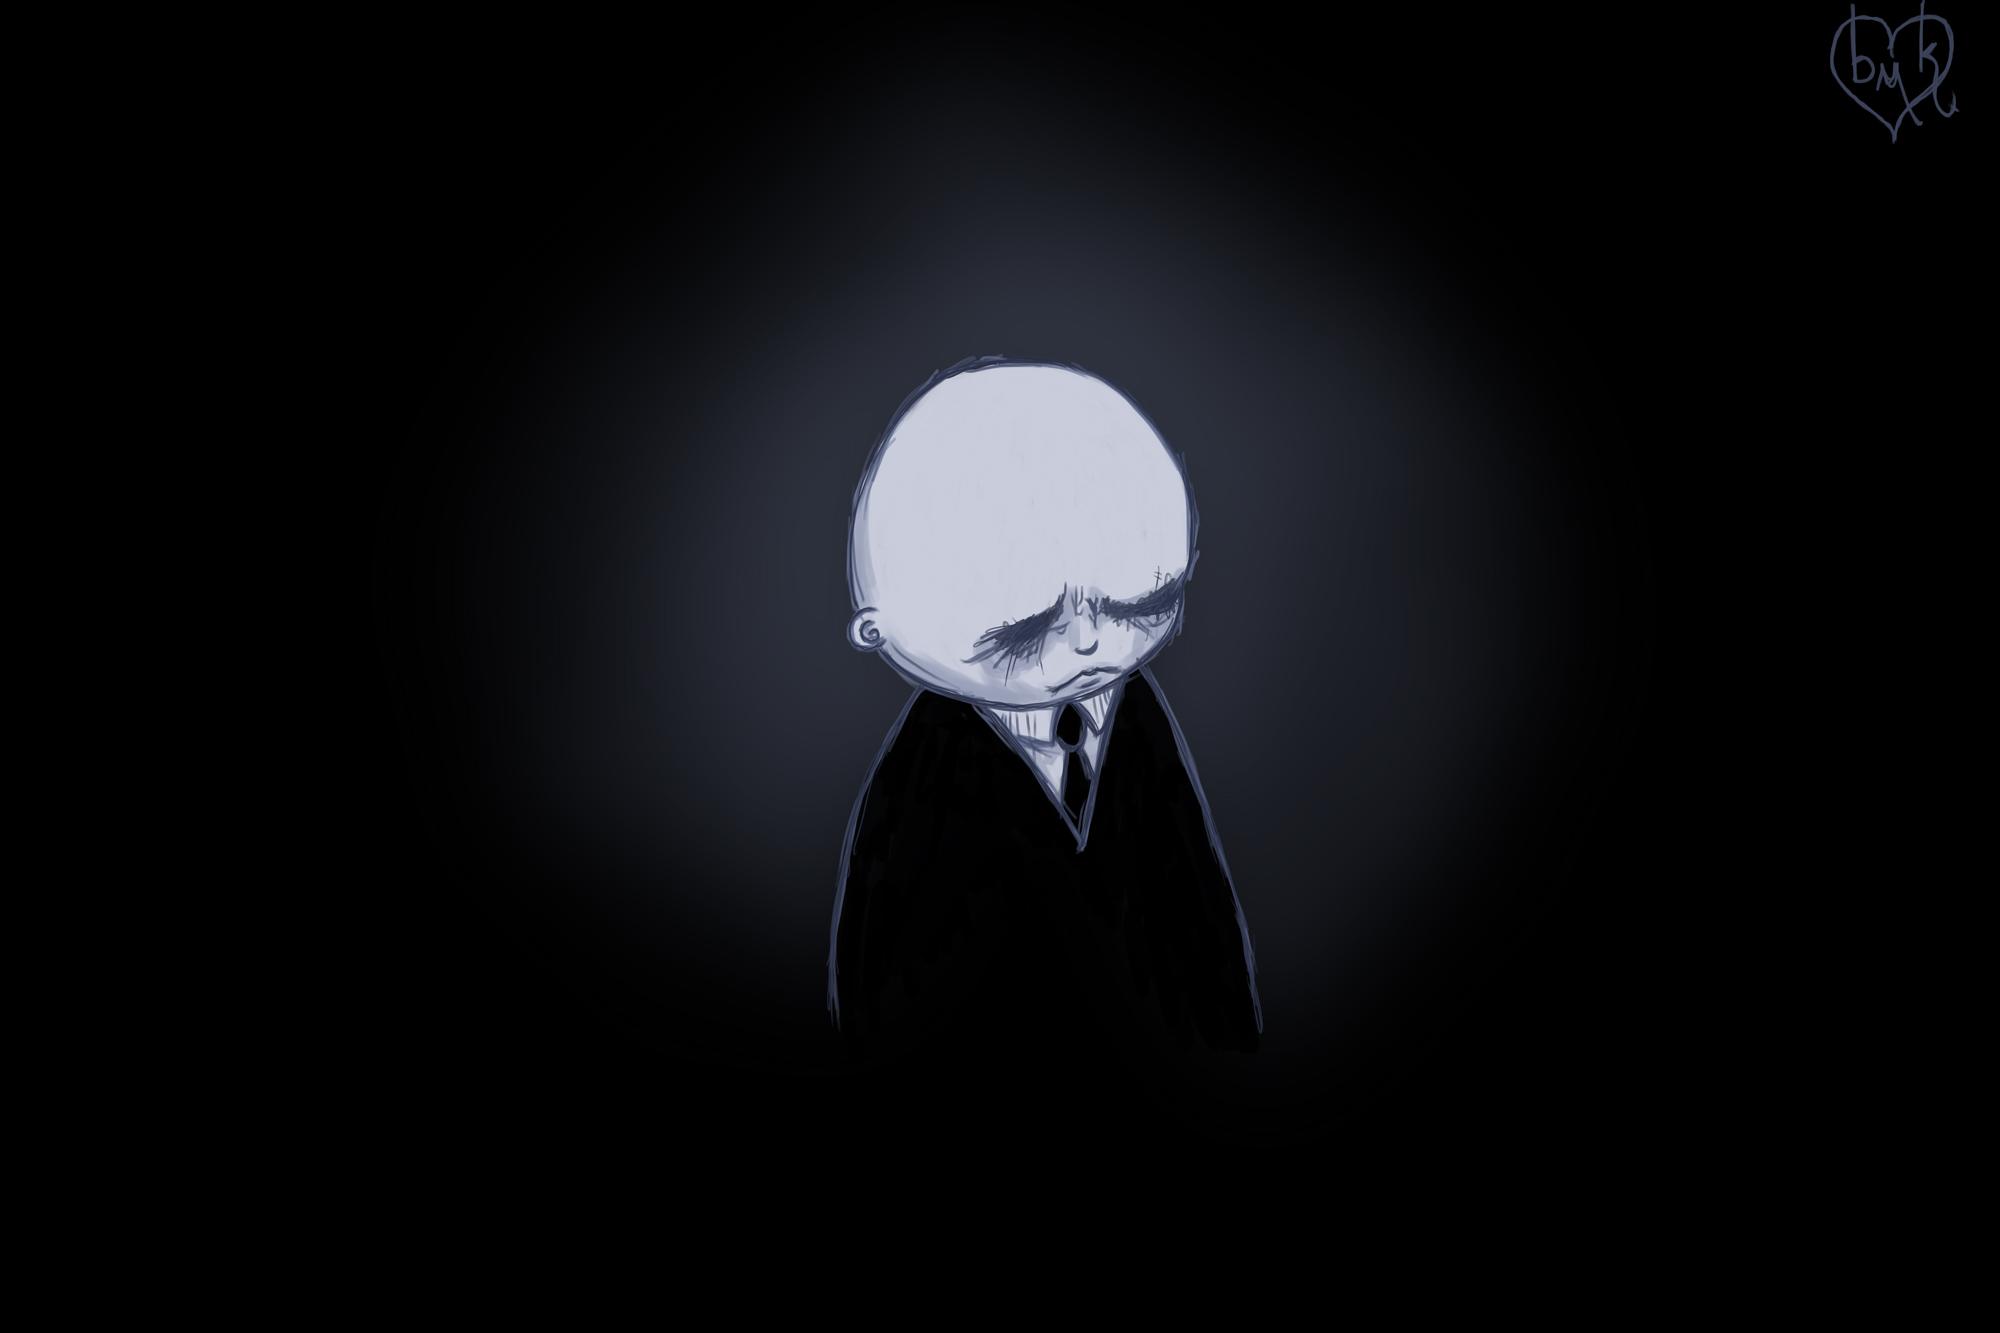 useless boy v2.0